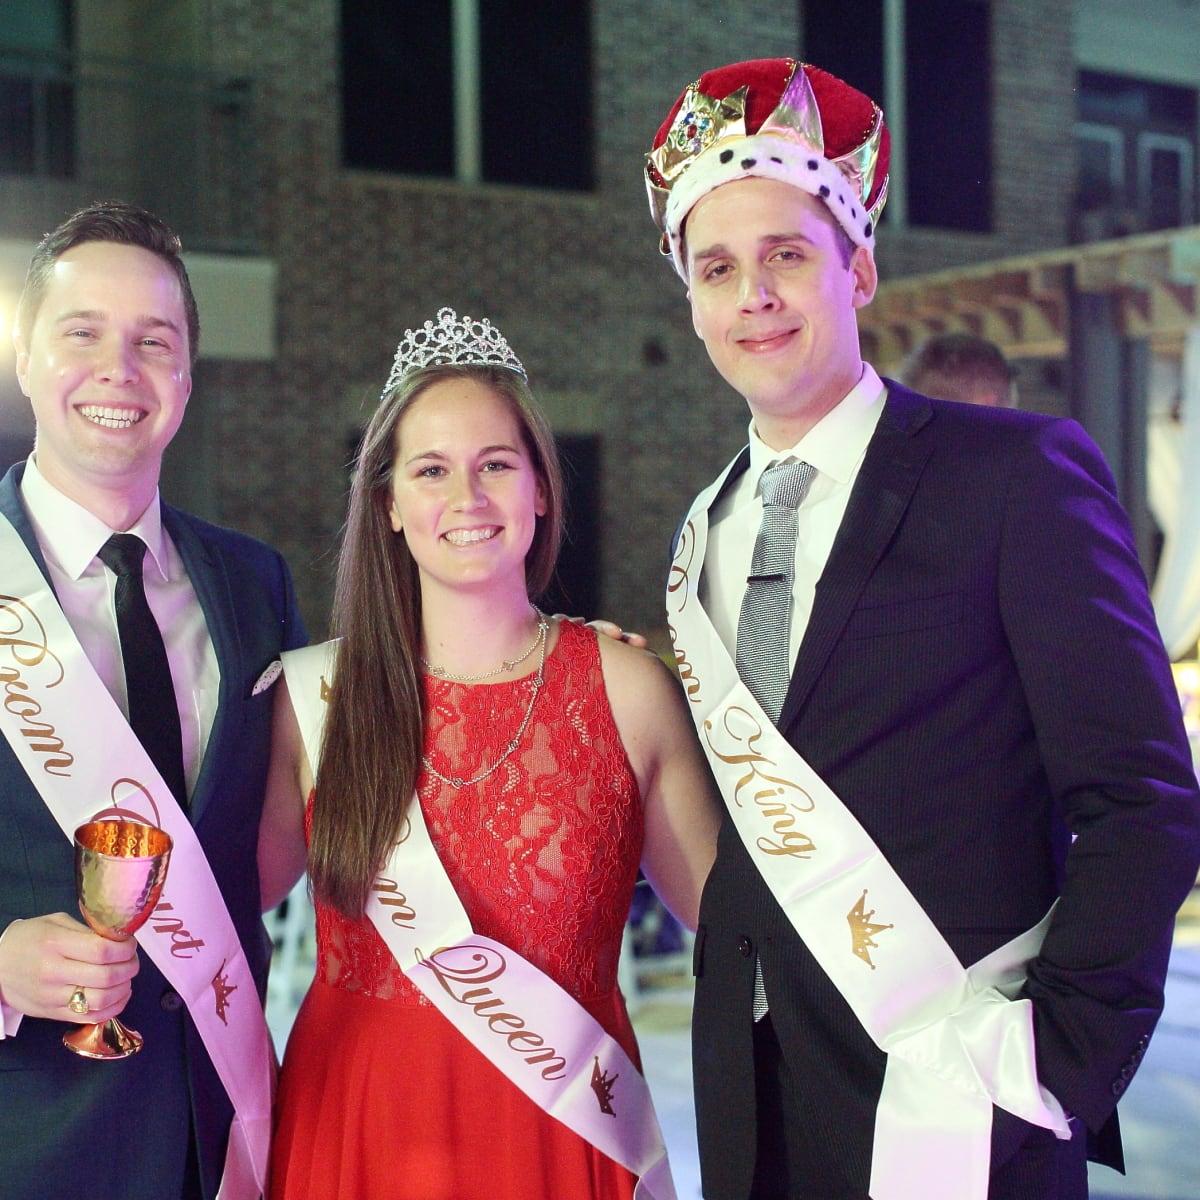 Houston, Big Brothers Big Sisters YP The Big Prom, Feb 2017, Michael Clinton, Brittany Metcalf, Grant Inman